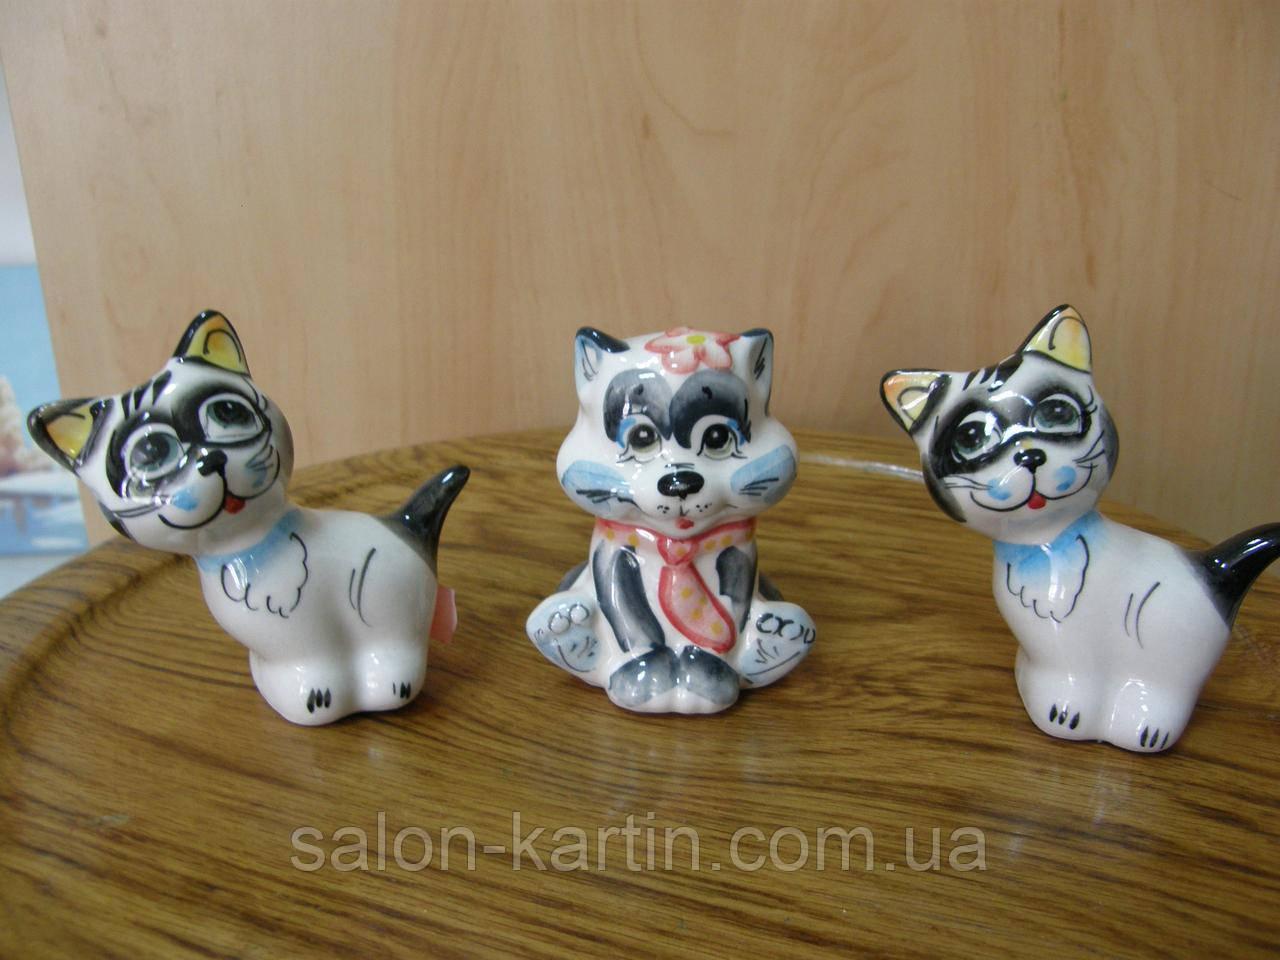 Статуэтка котенок